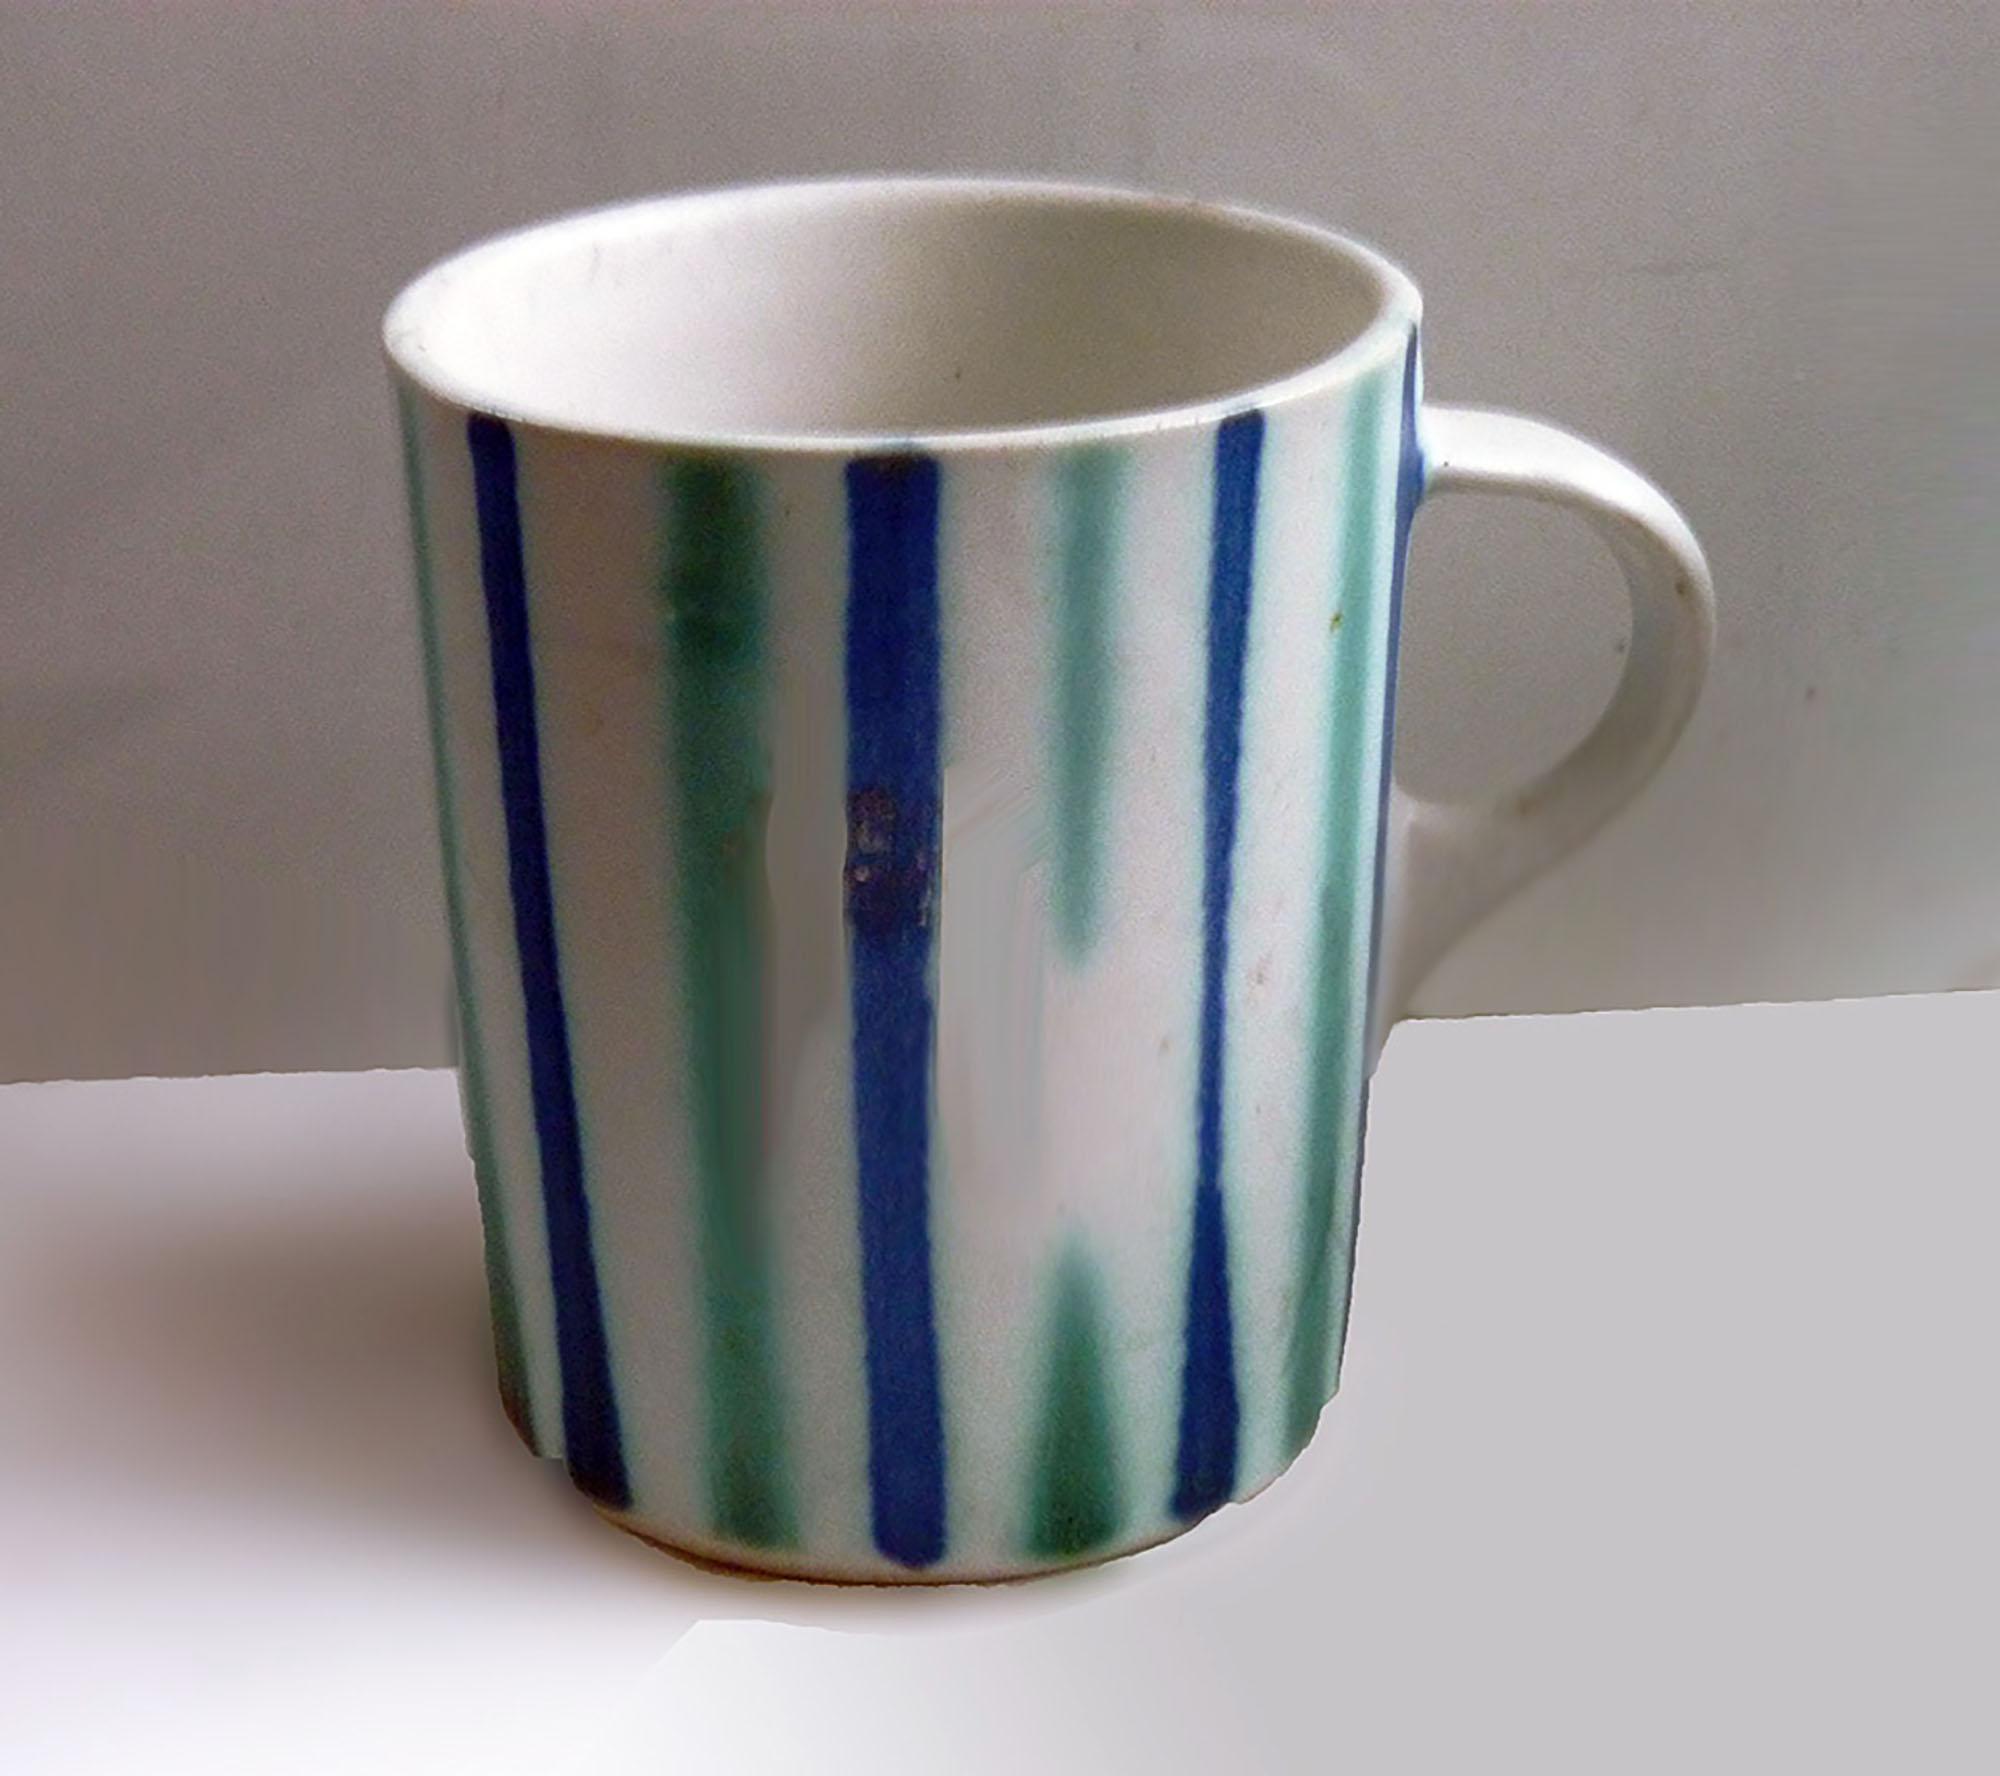 Vintage Straight Mug in Blue Green Stripes